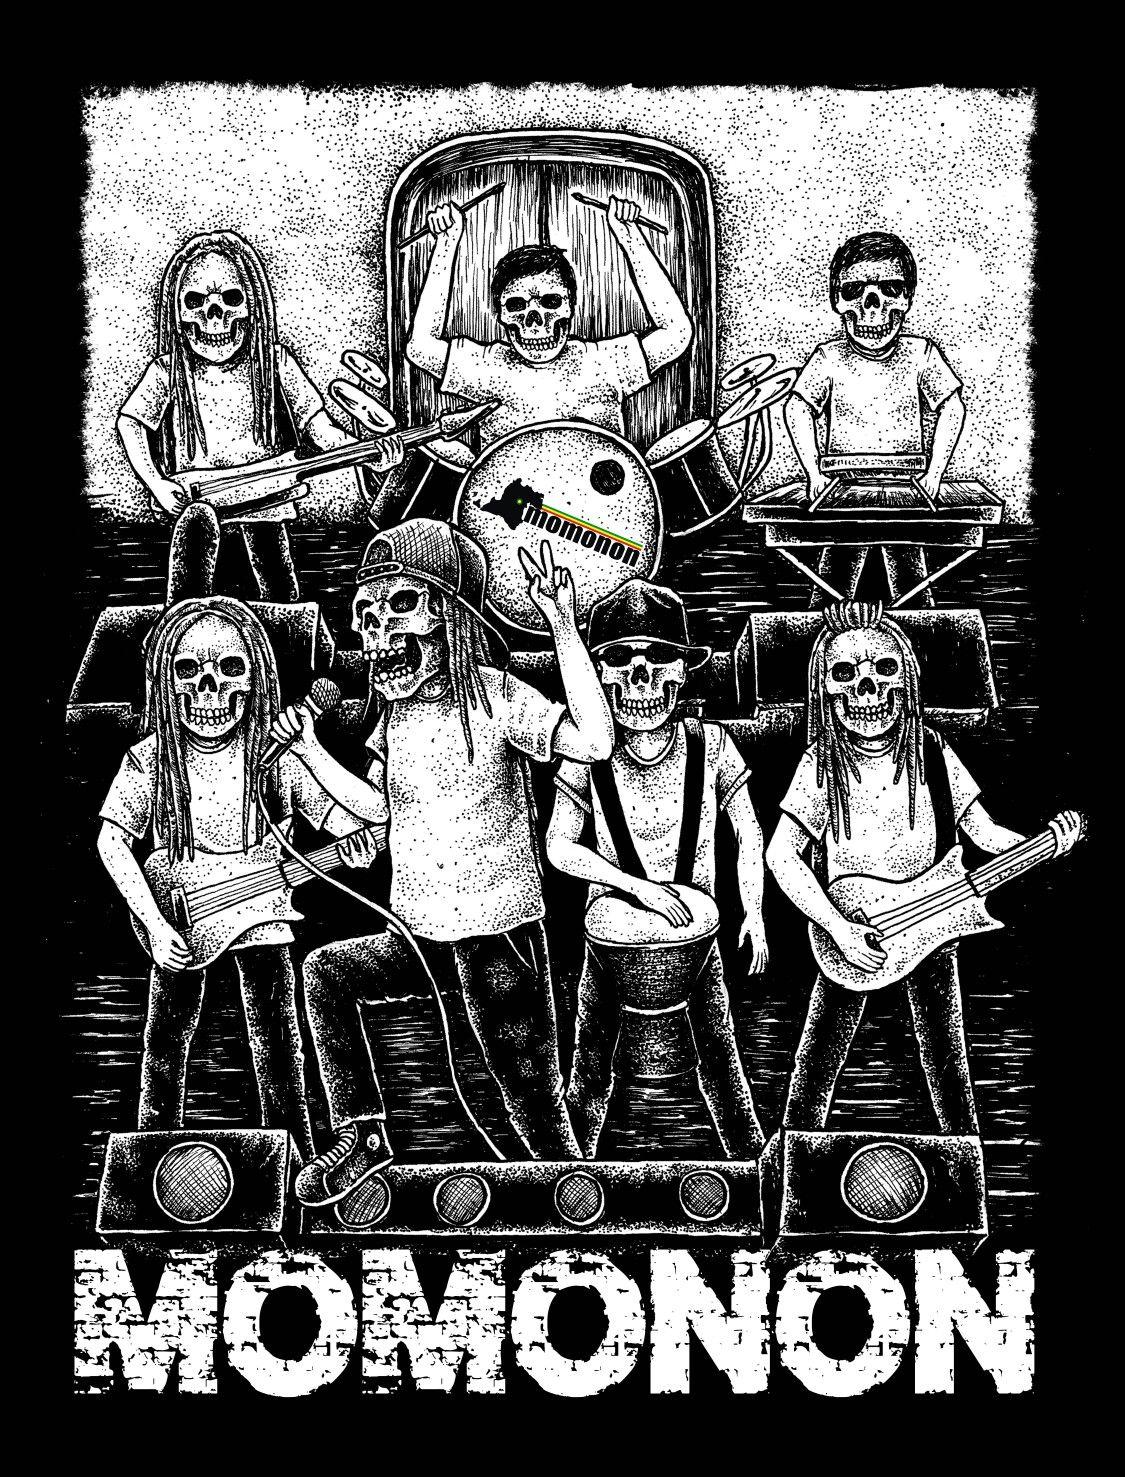 Lirik Lagu Canda Tawamu Momonon : lirik, canda, tawamu, momonon, Liric:, Lirik, Reggae, Momonon, Canda, Tawamu, Lengkap, Gitar